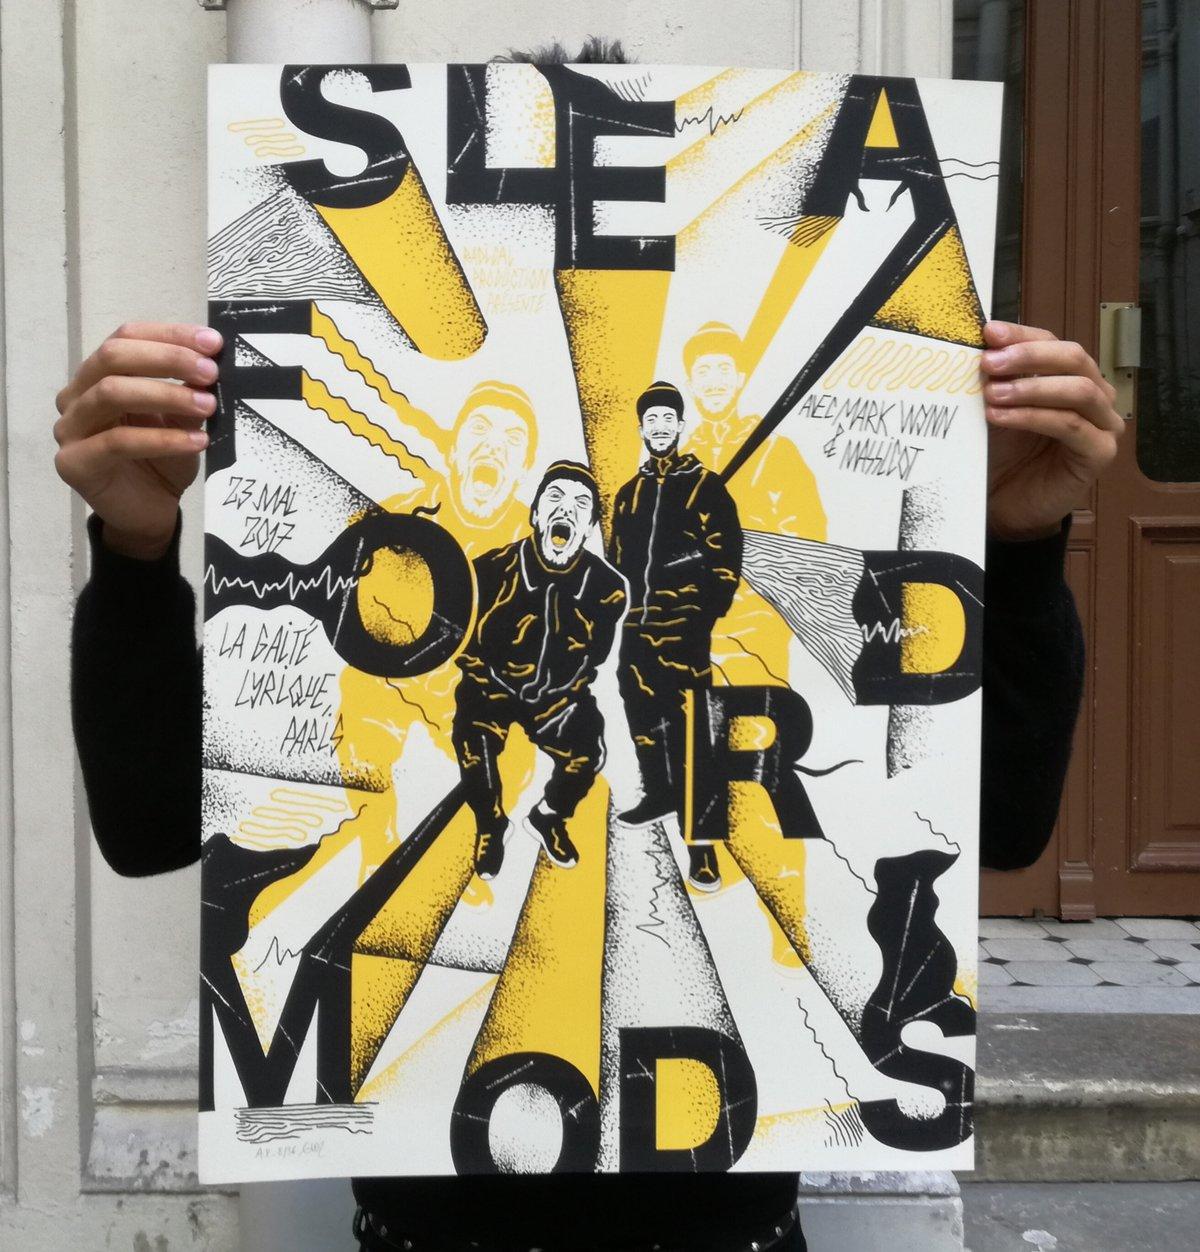 SLEAFORD MODS (Paris 2017) screenprinted poster